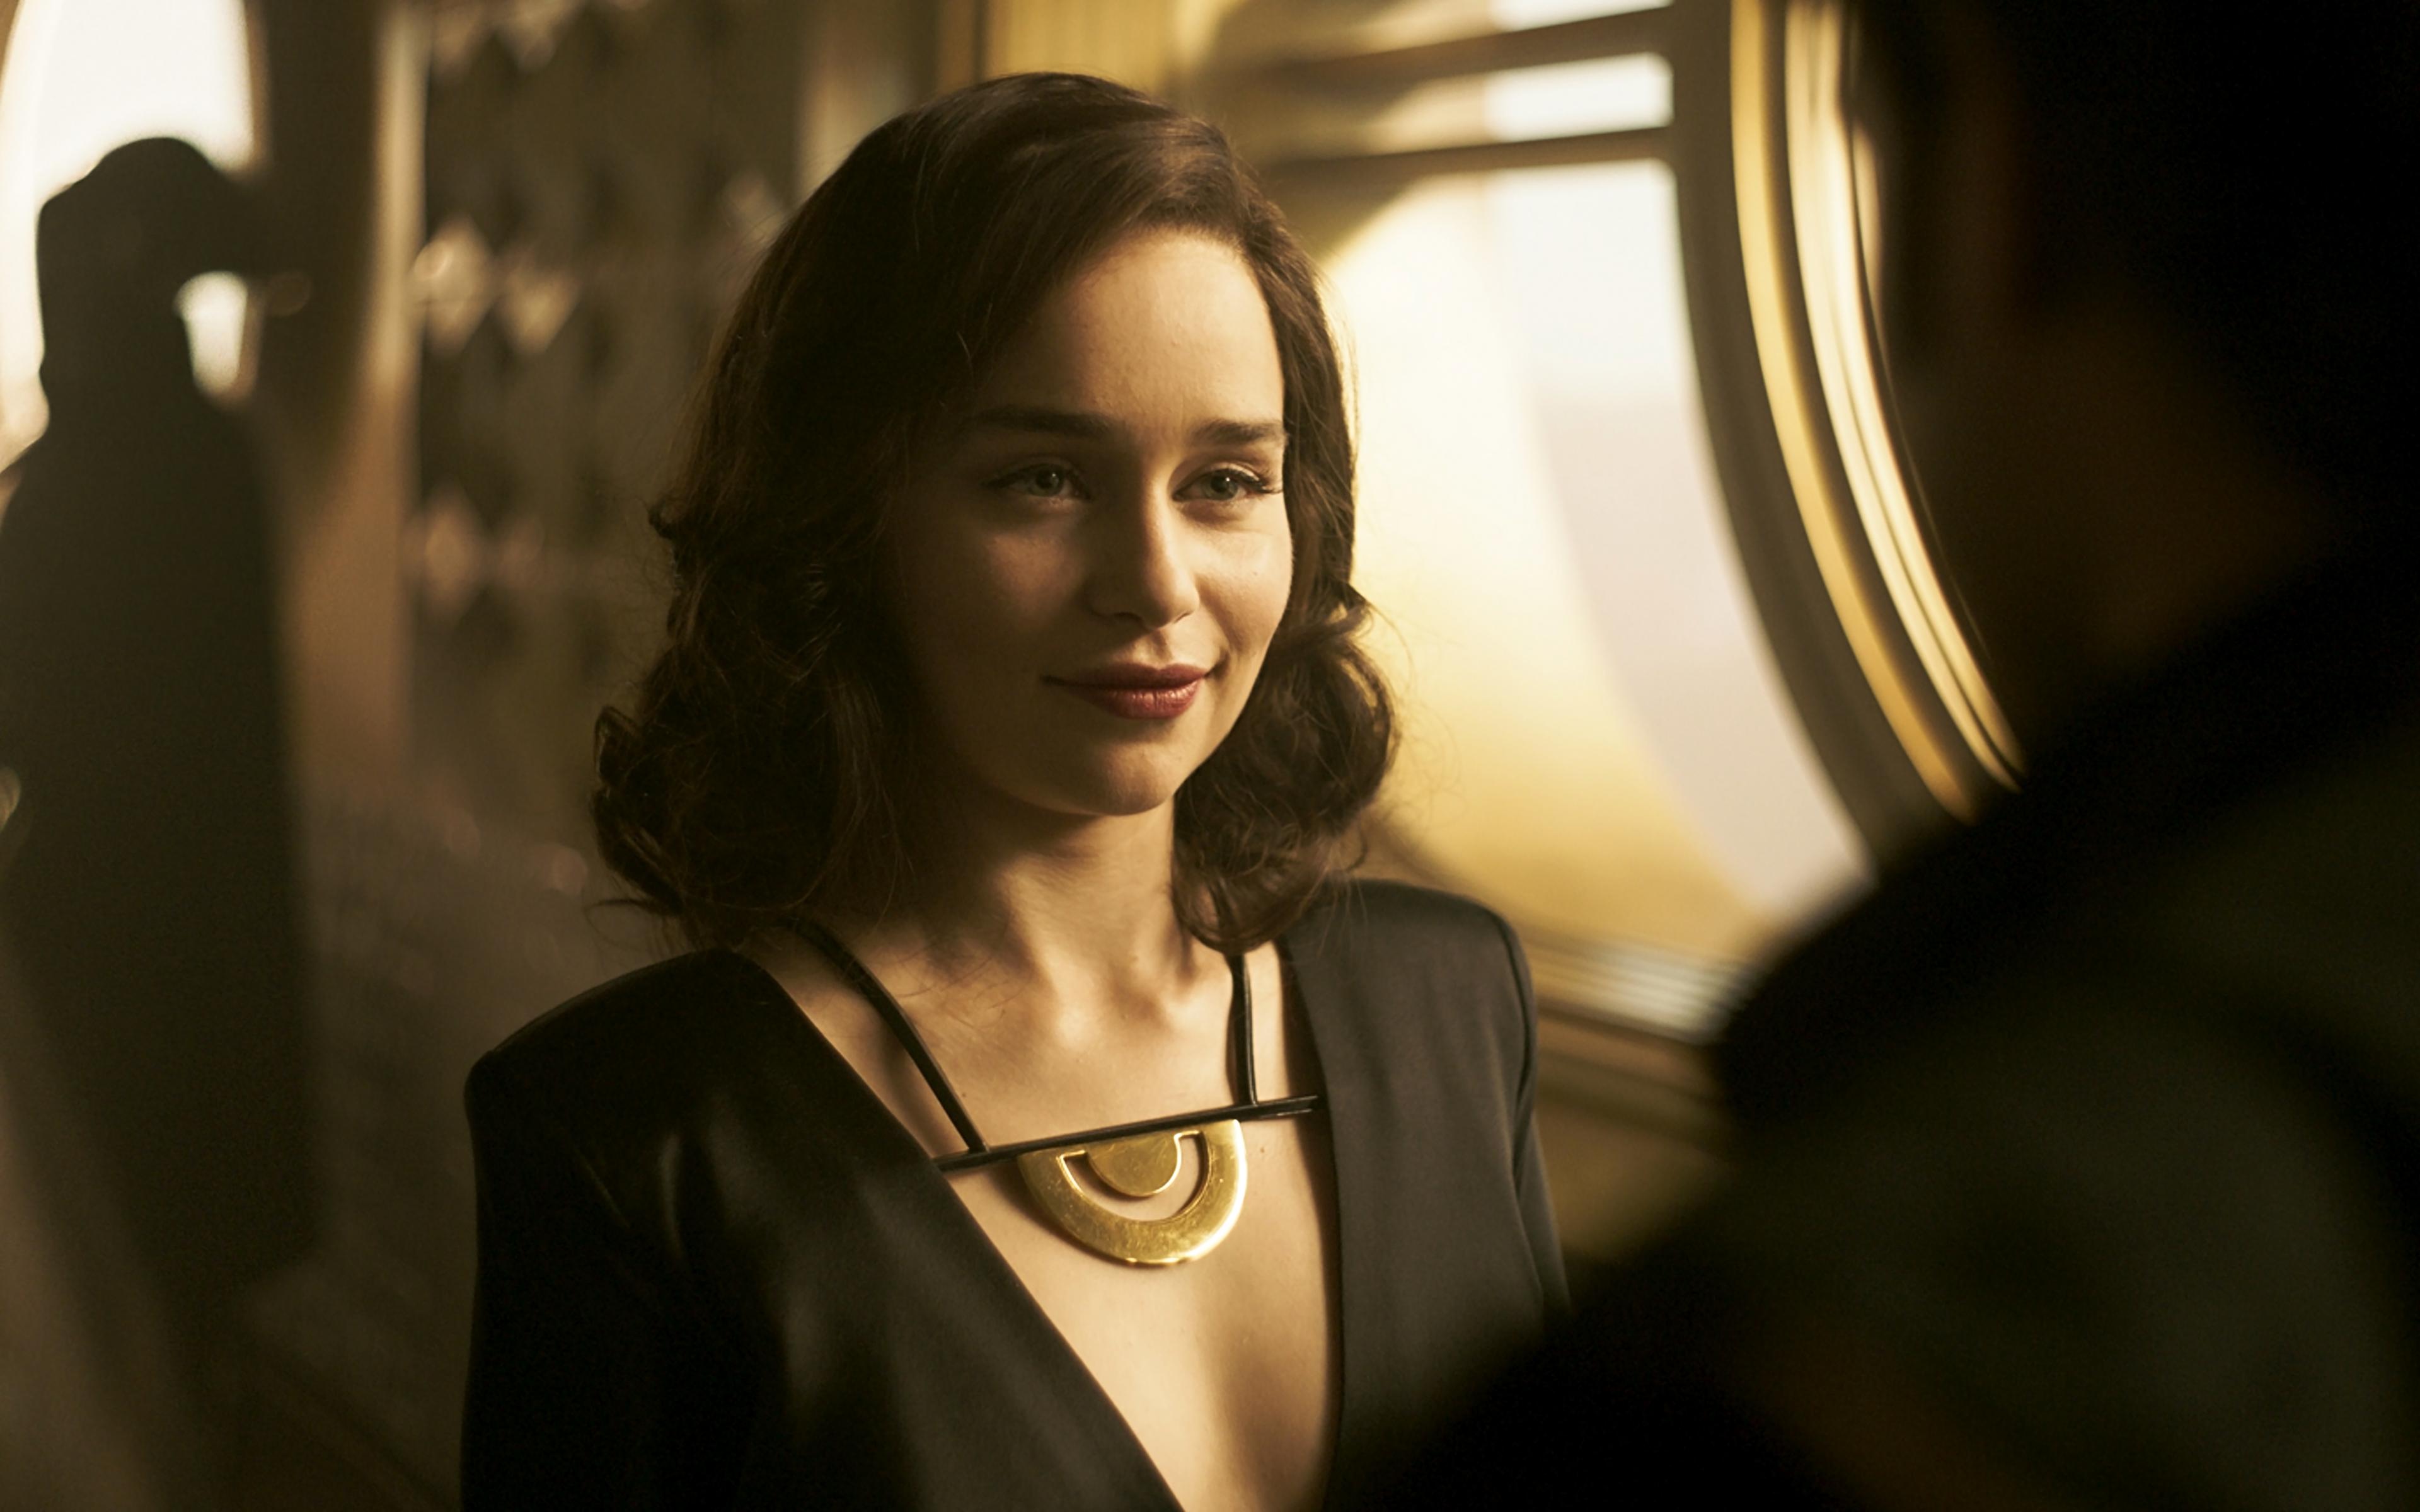 Emilia Clark As Qira In Solo A Star Wars Story Wallpaper 4k Ultra